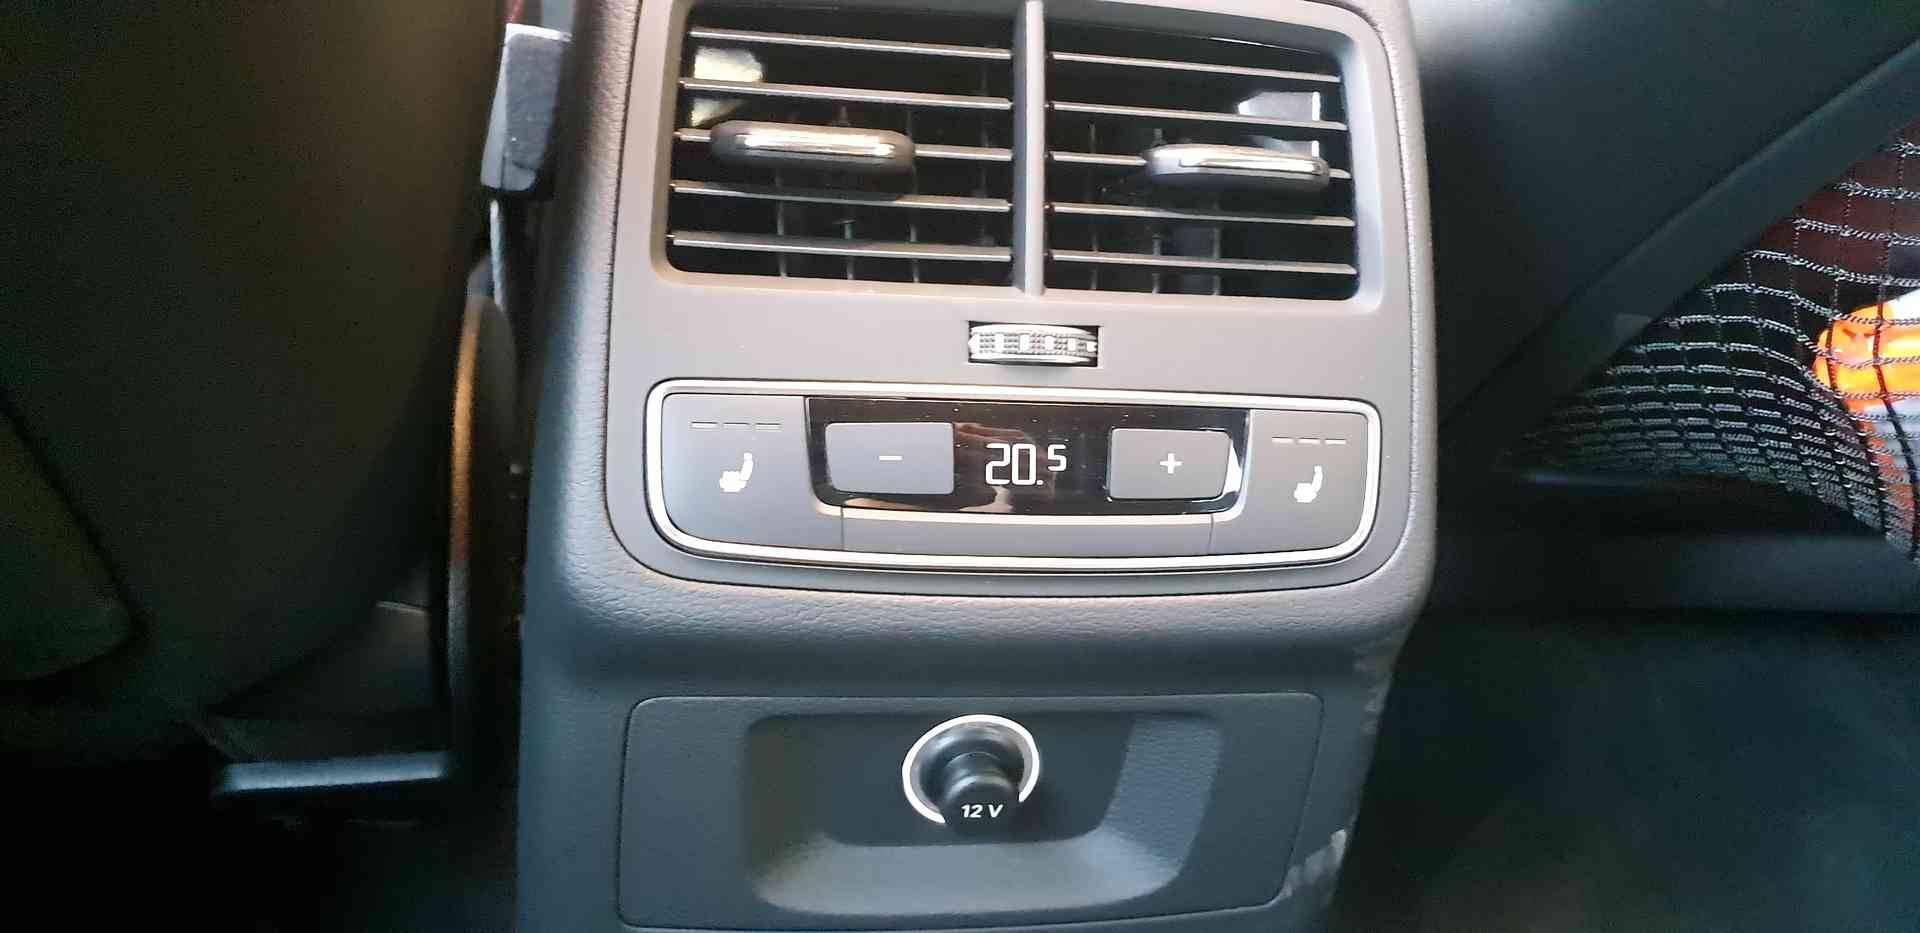 13 - RS4 Avant V6 2.9 TFSI 450 ch Tiptronic 8